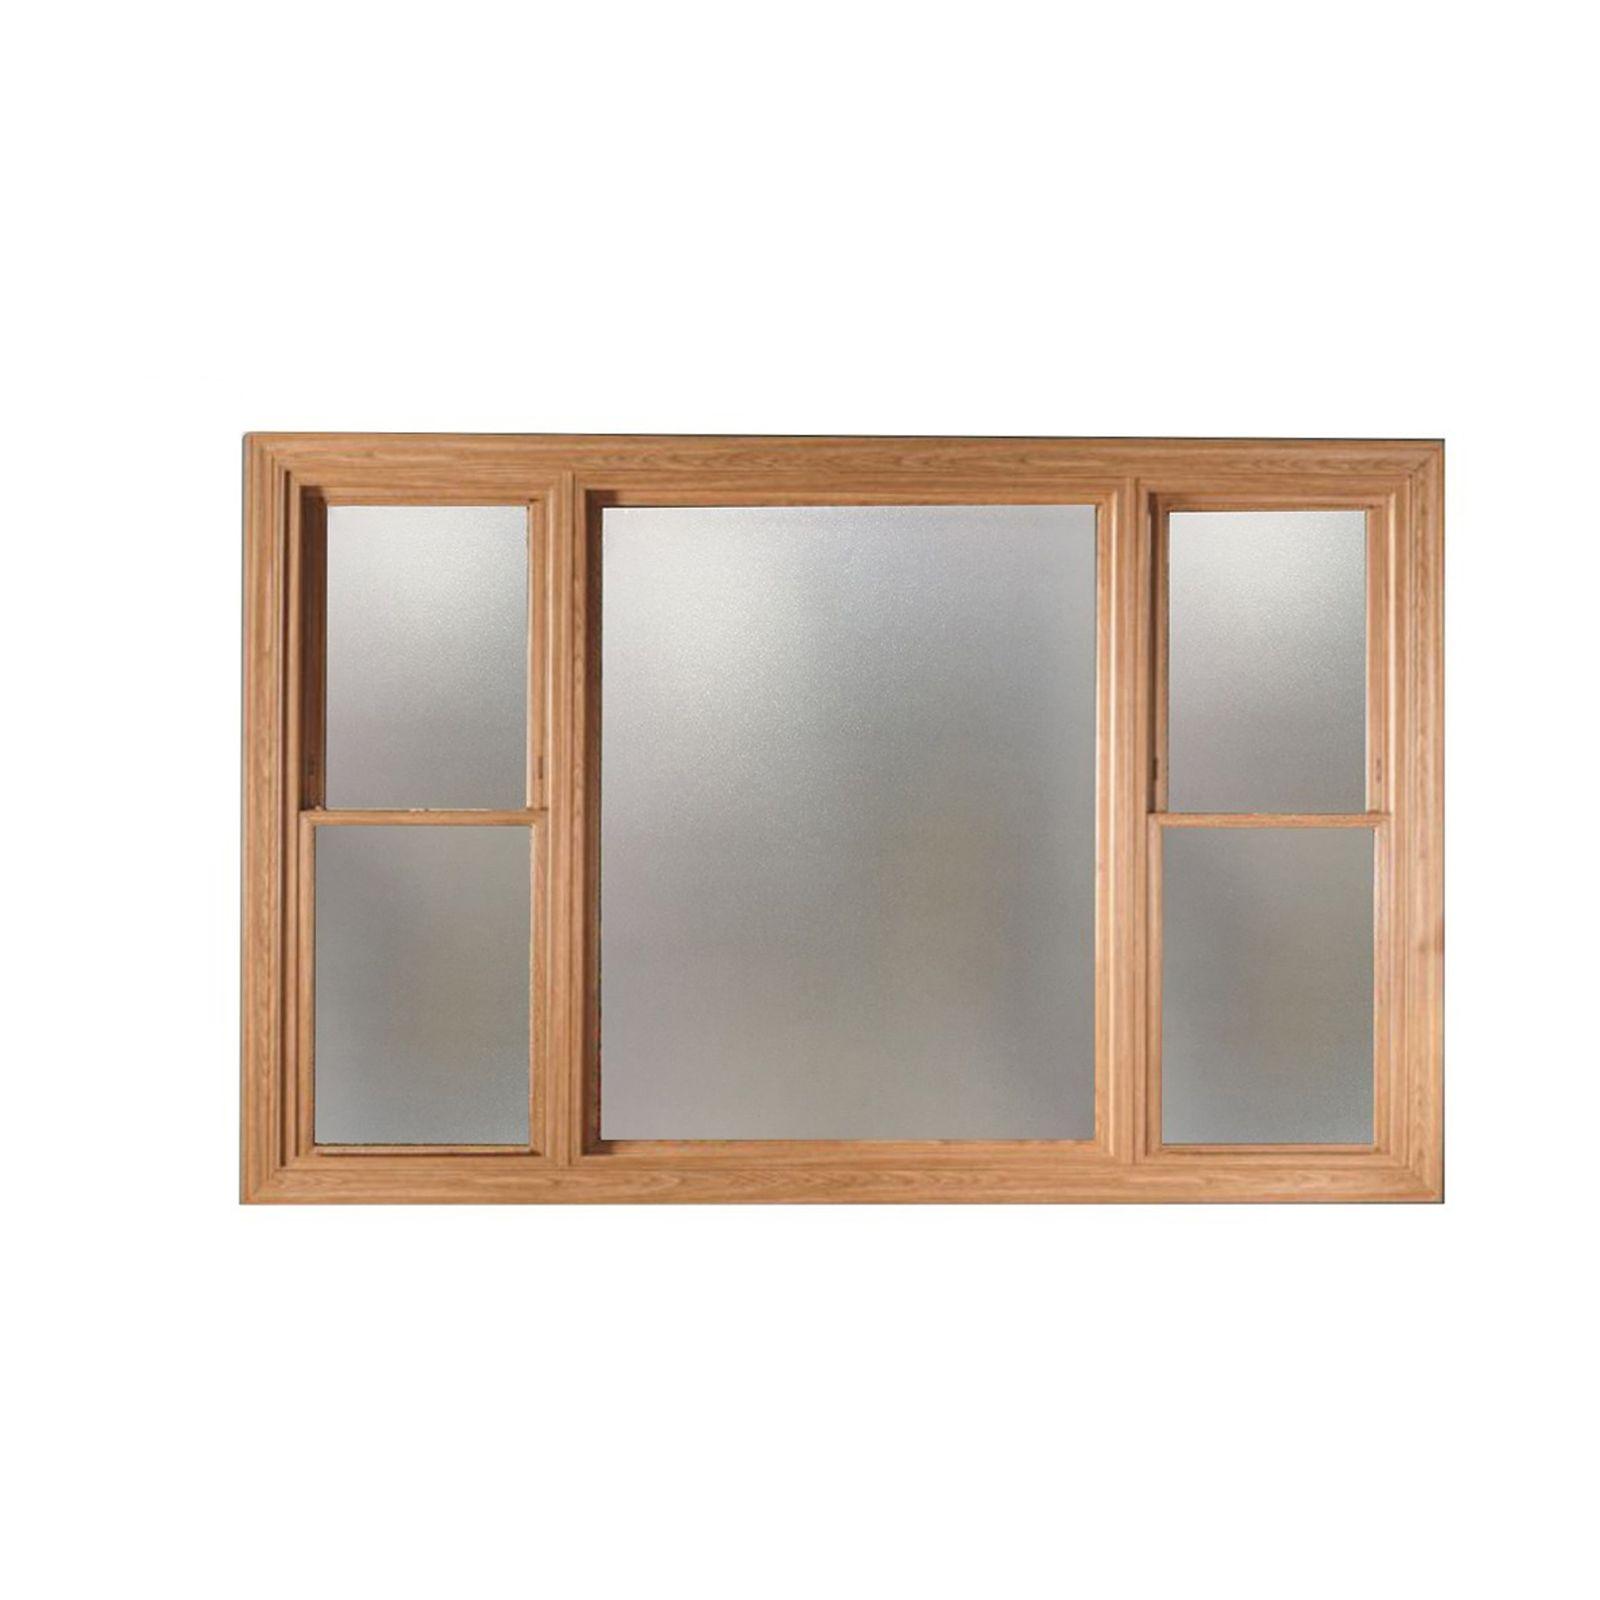 شیشه مات کن ساده یونیک کد9015 main 1 1